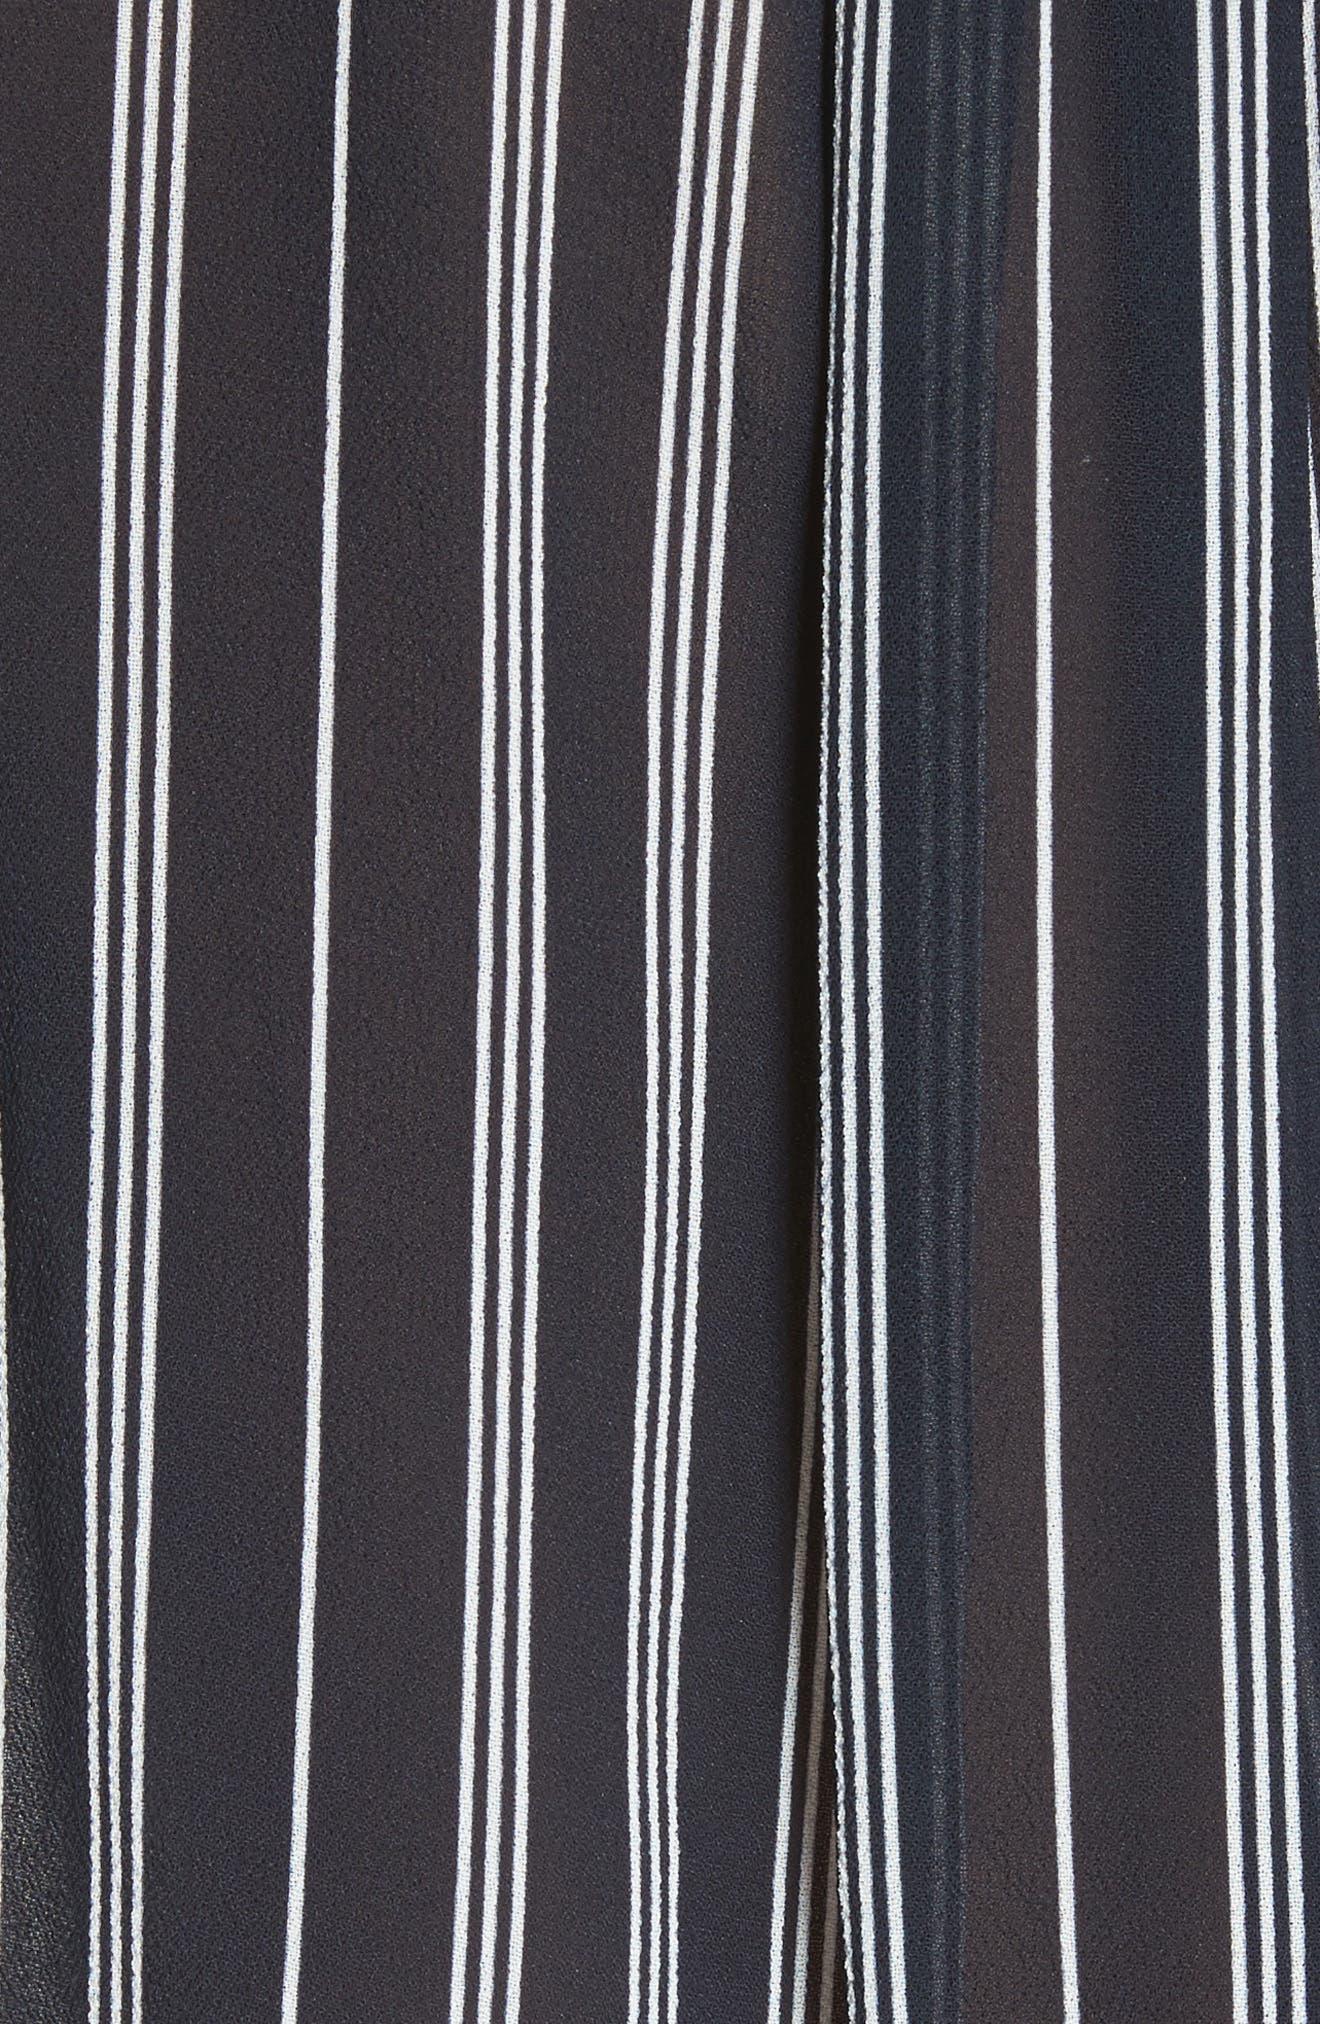 Victor Surplice Neck Tank Top,                             Alternate thumbnail 5, color,                             Navy Stripe